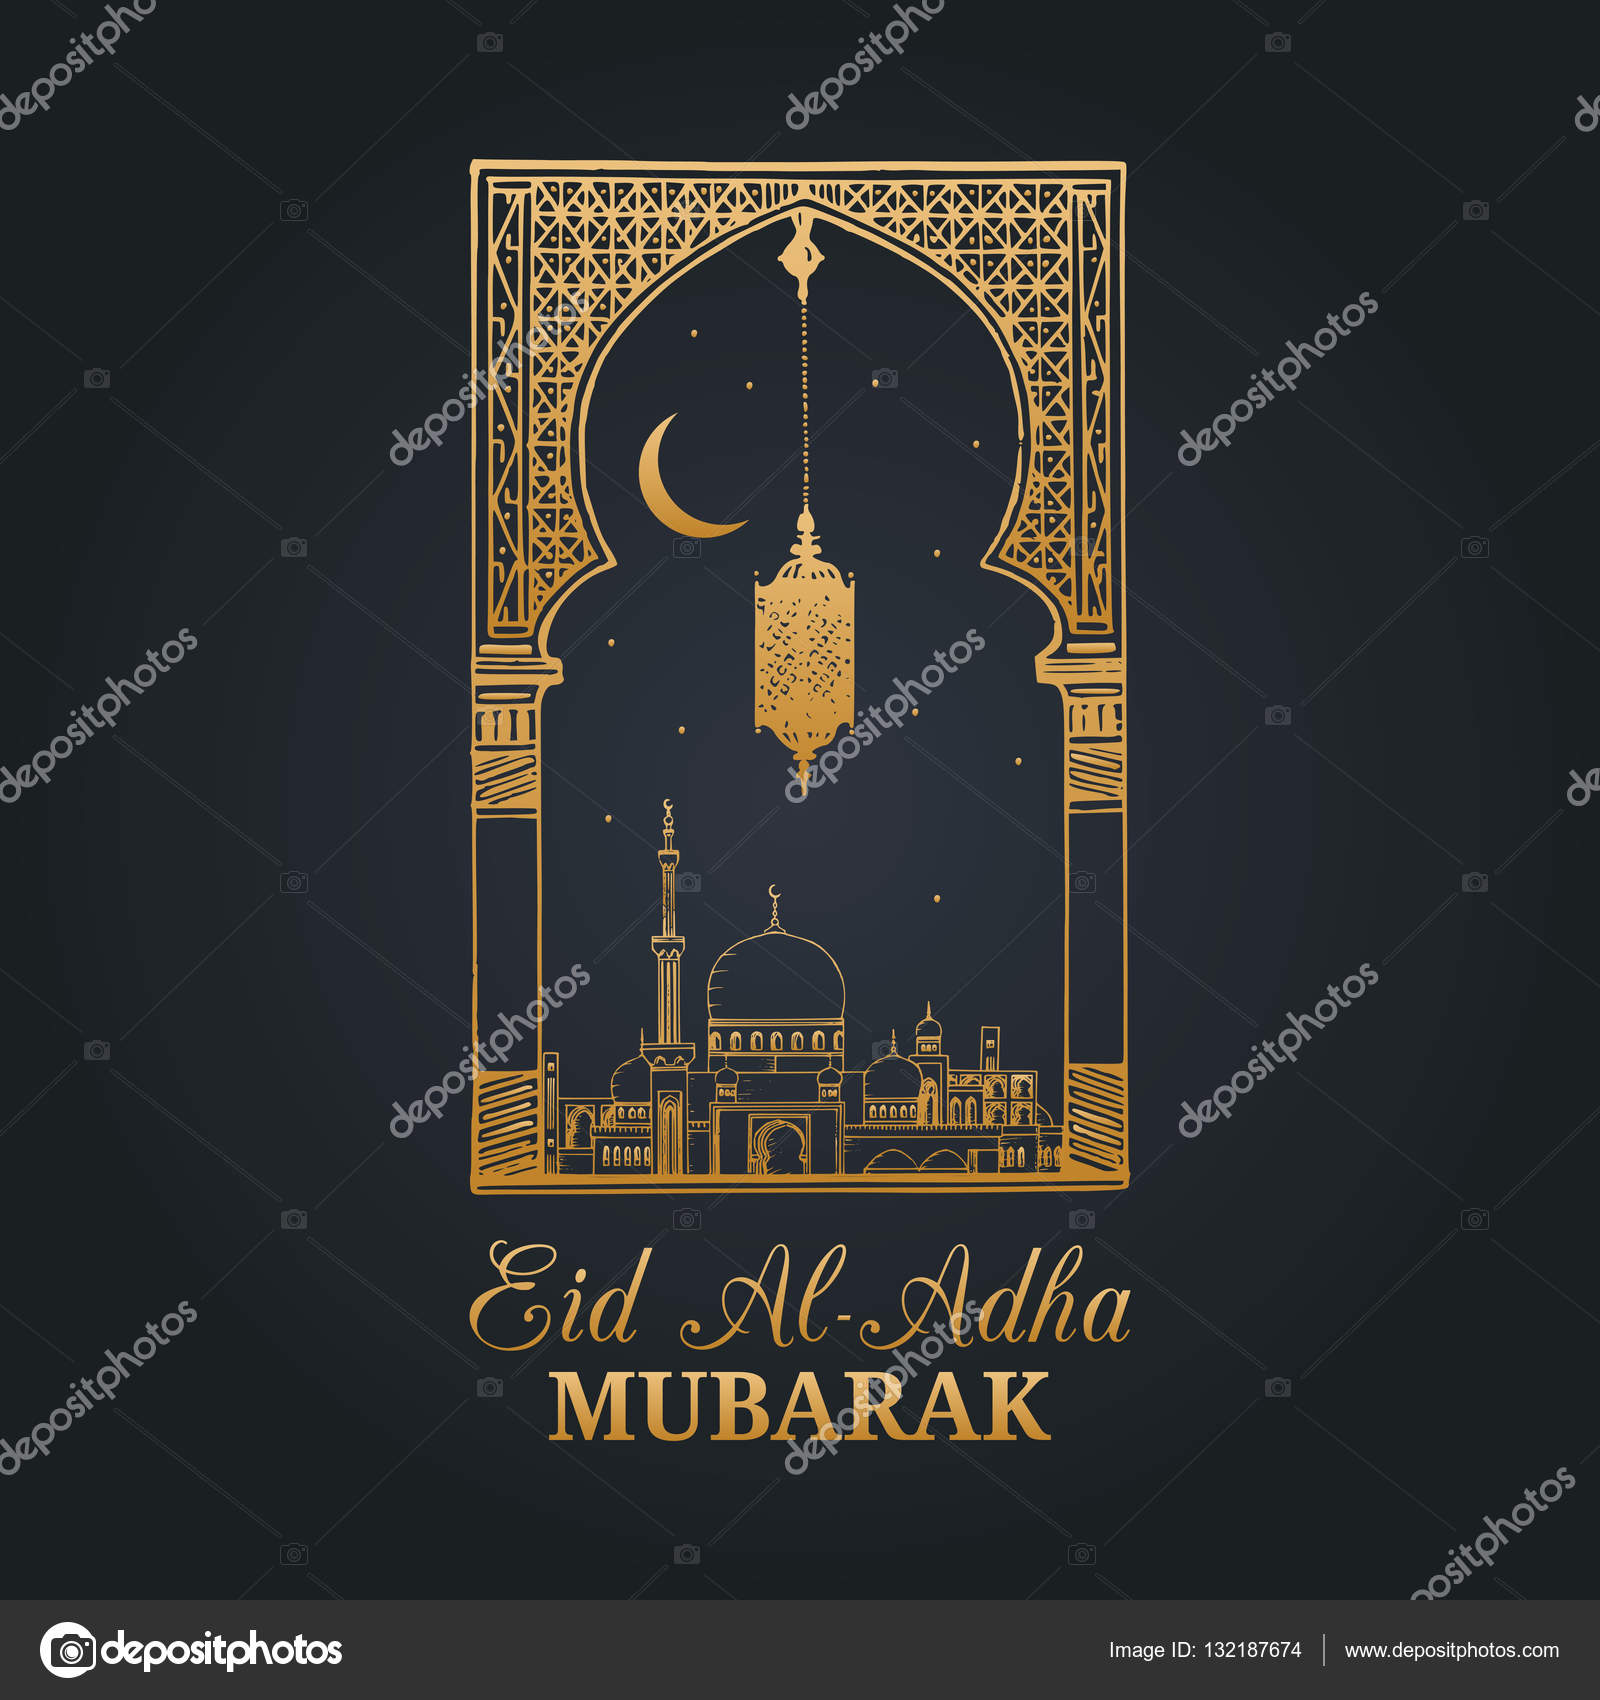 Eid al adha greeting card stock vector vladayoung 132187674 eid al adha greeting card stock vector m4hsunfo